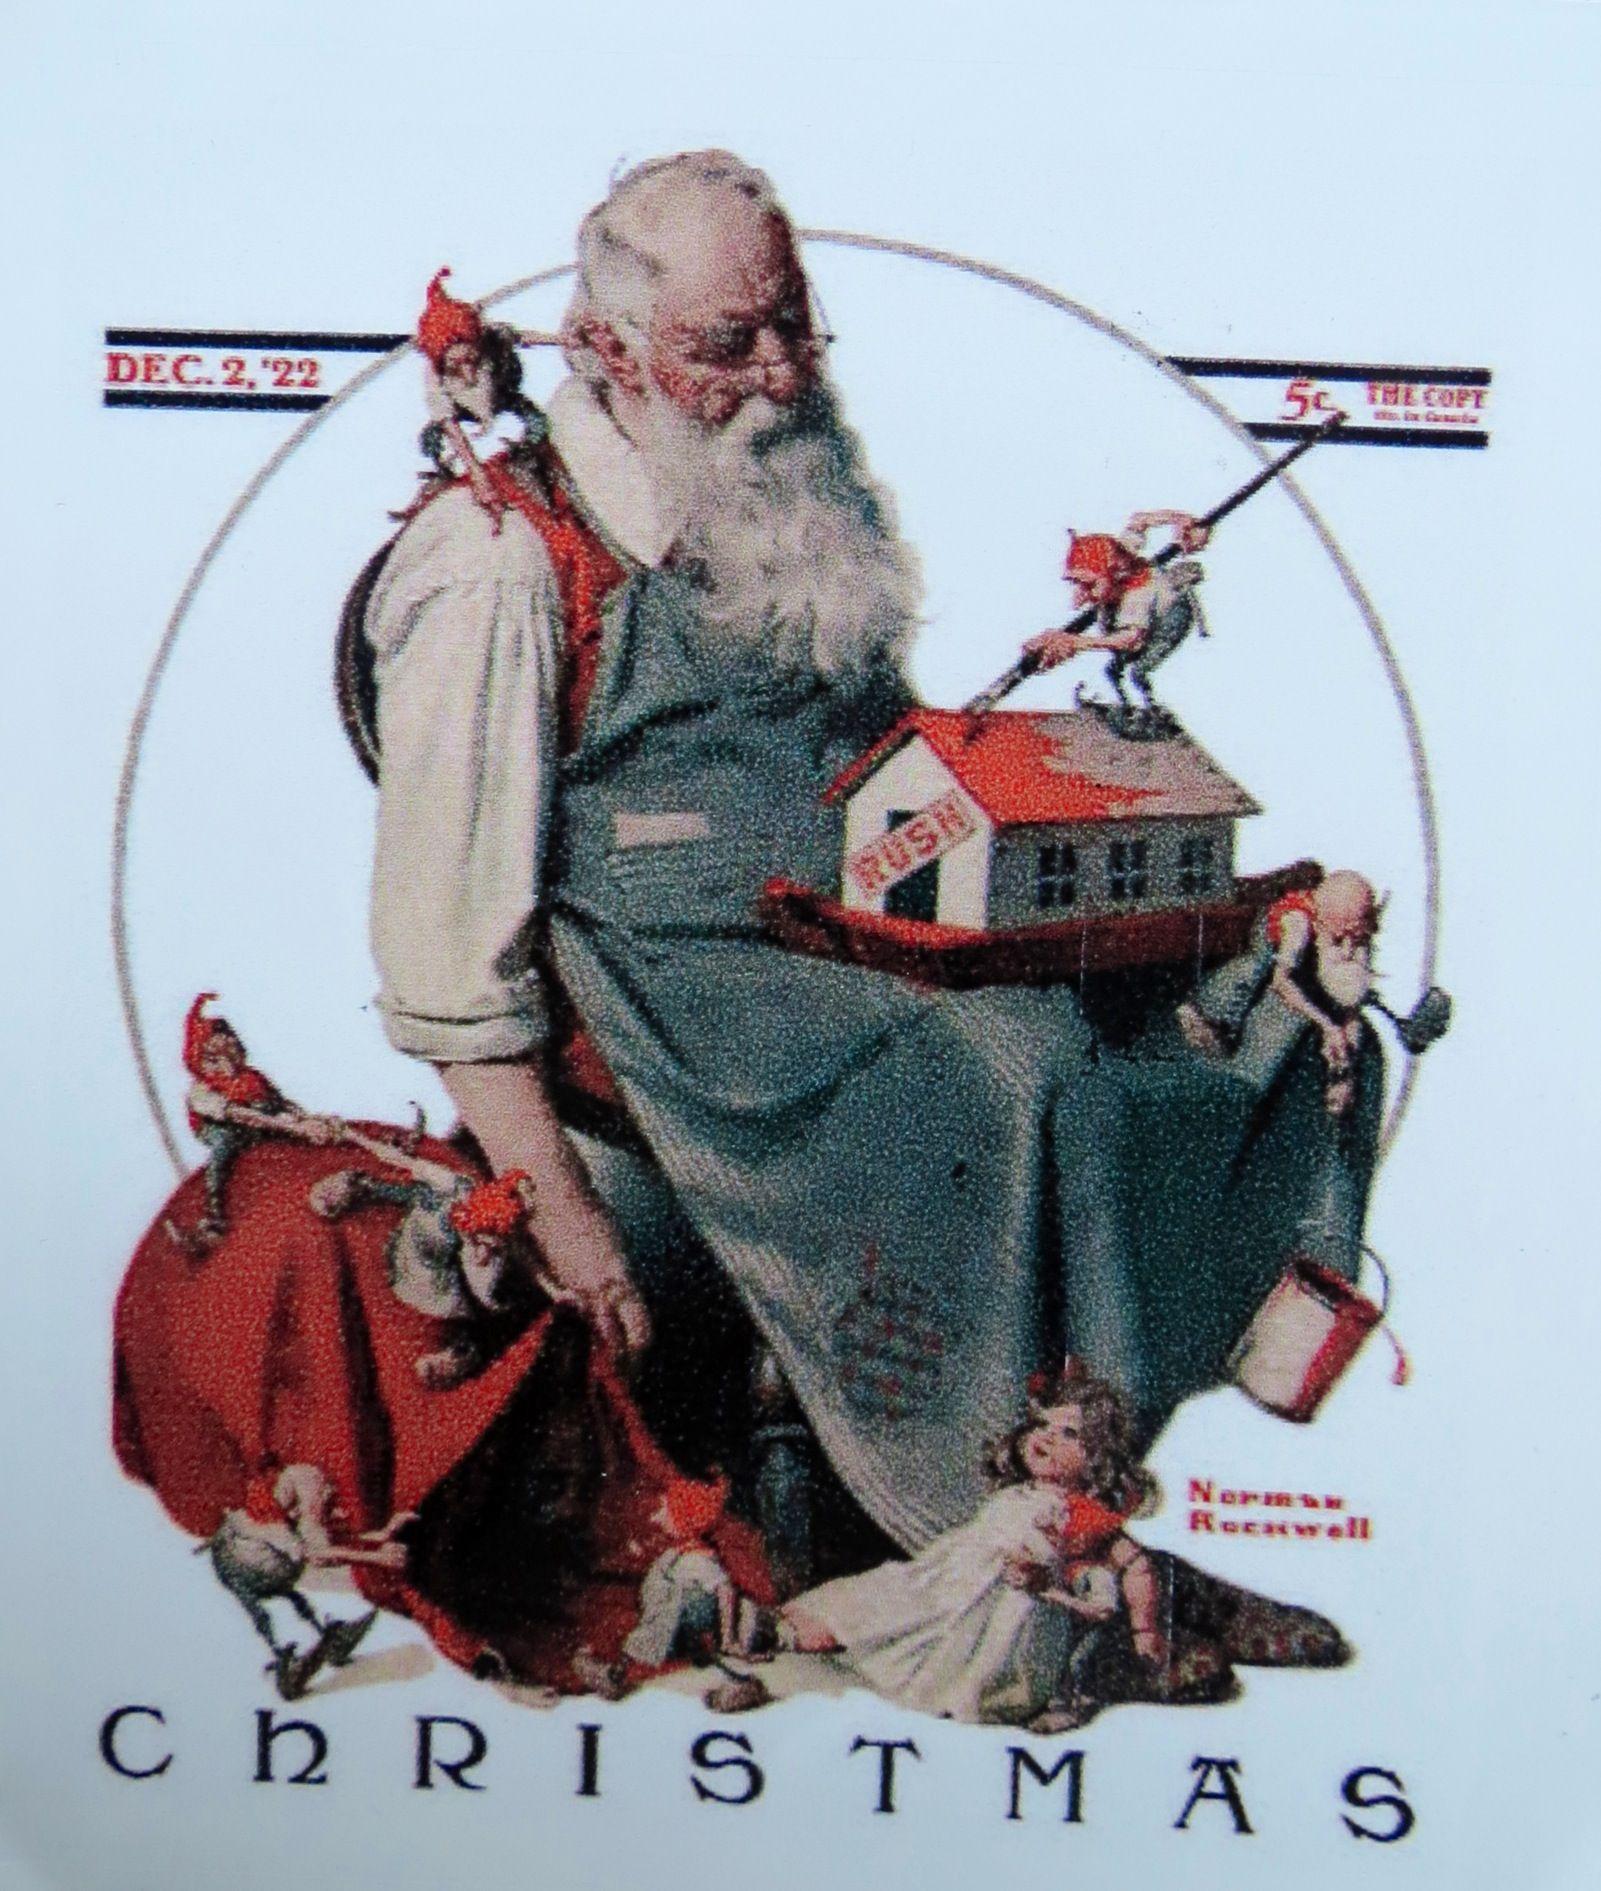 Norman Rockwell Christmas | Norman Rockwell: Christmas ...